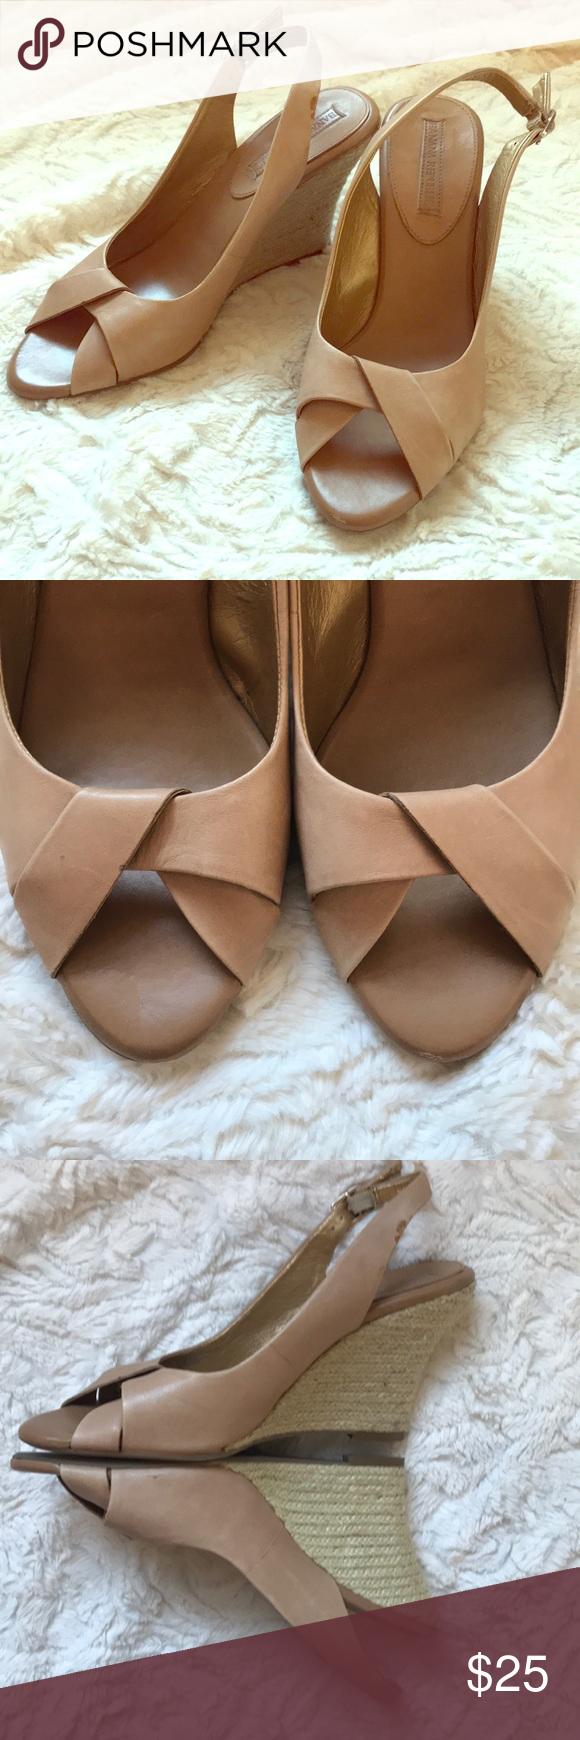 Lyst - ALDO Ldo Elley Nude Wedge Sandals in Natural